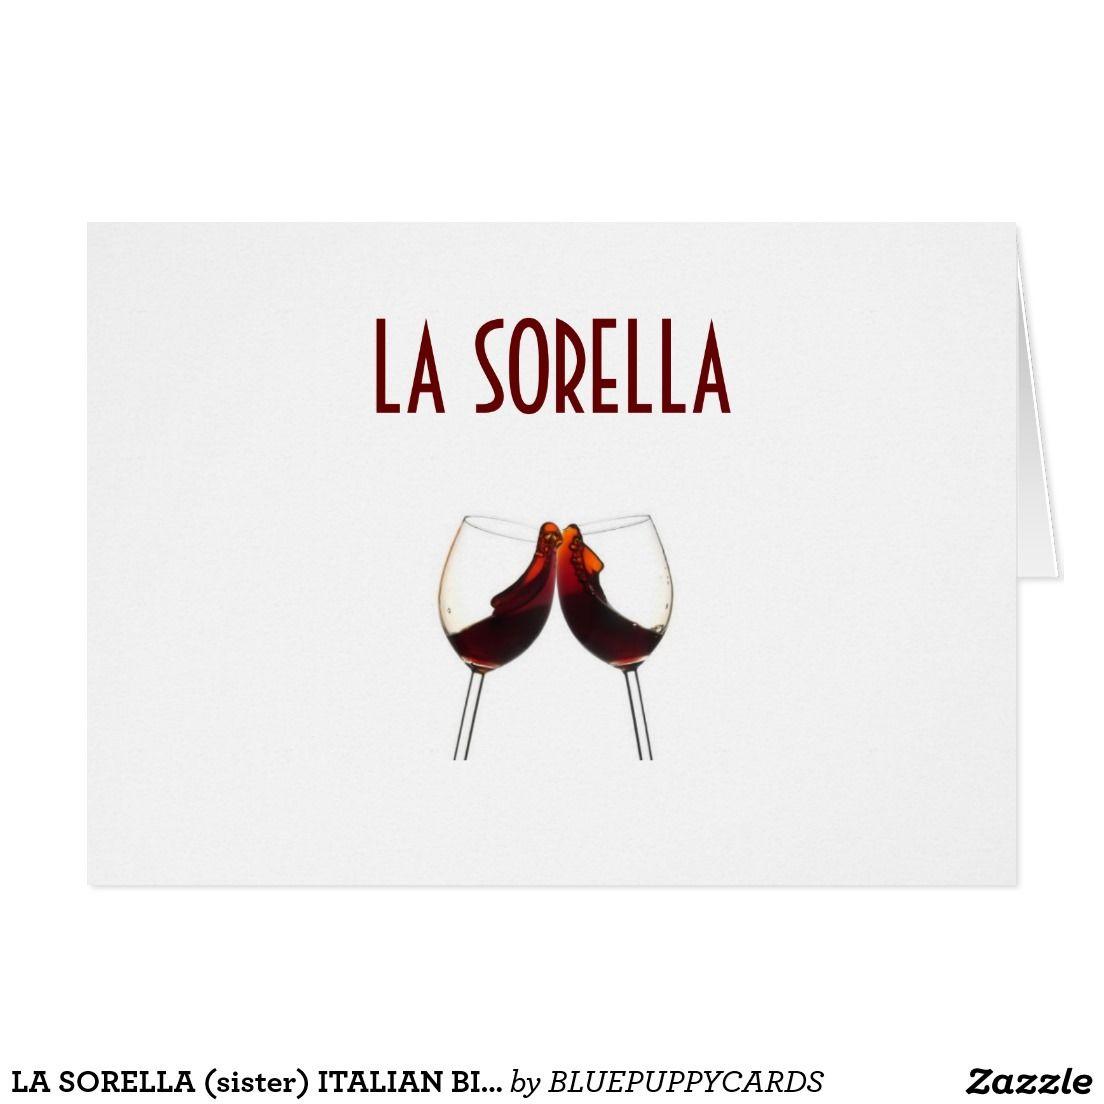 LA SORELLA sister ITALIAN BIRTHDAY CARD AND CHECK OUT MY OTHER – Italian Birthday Card